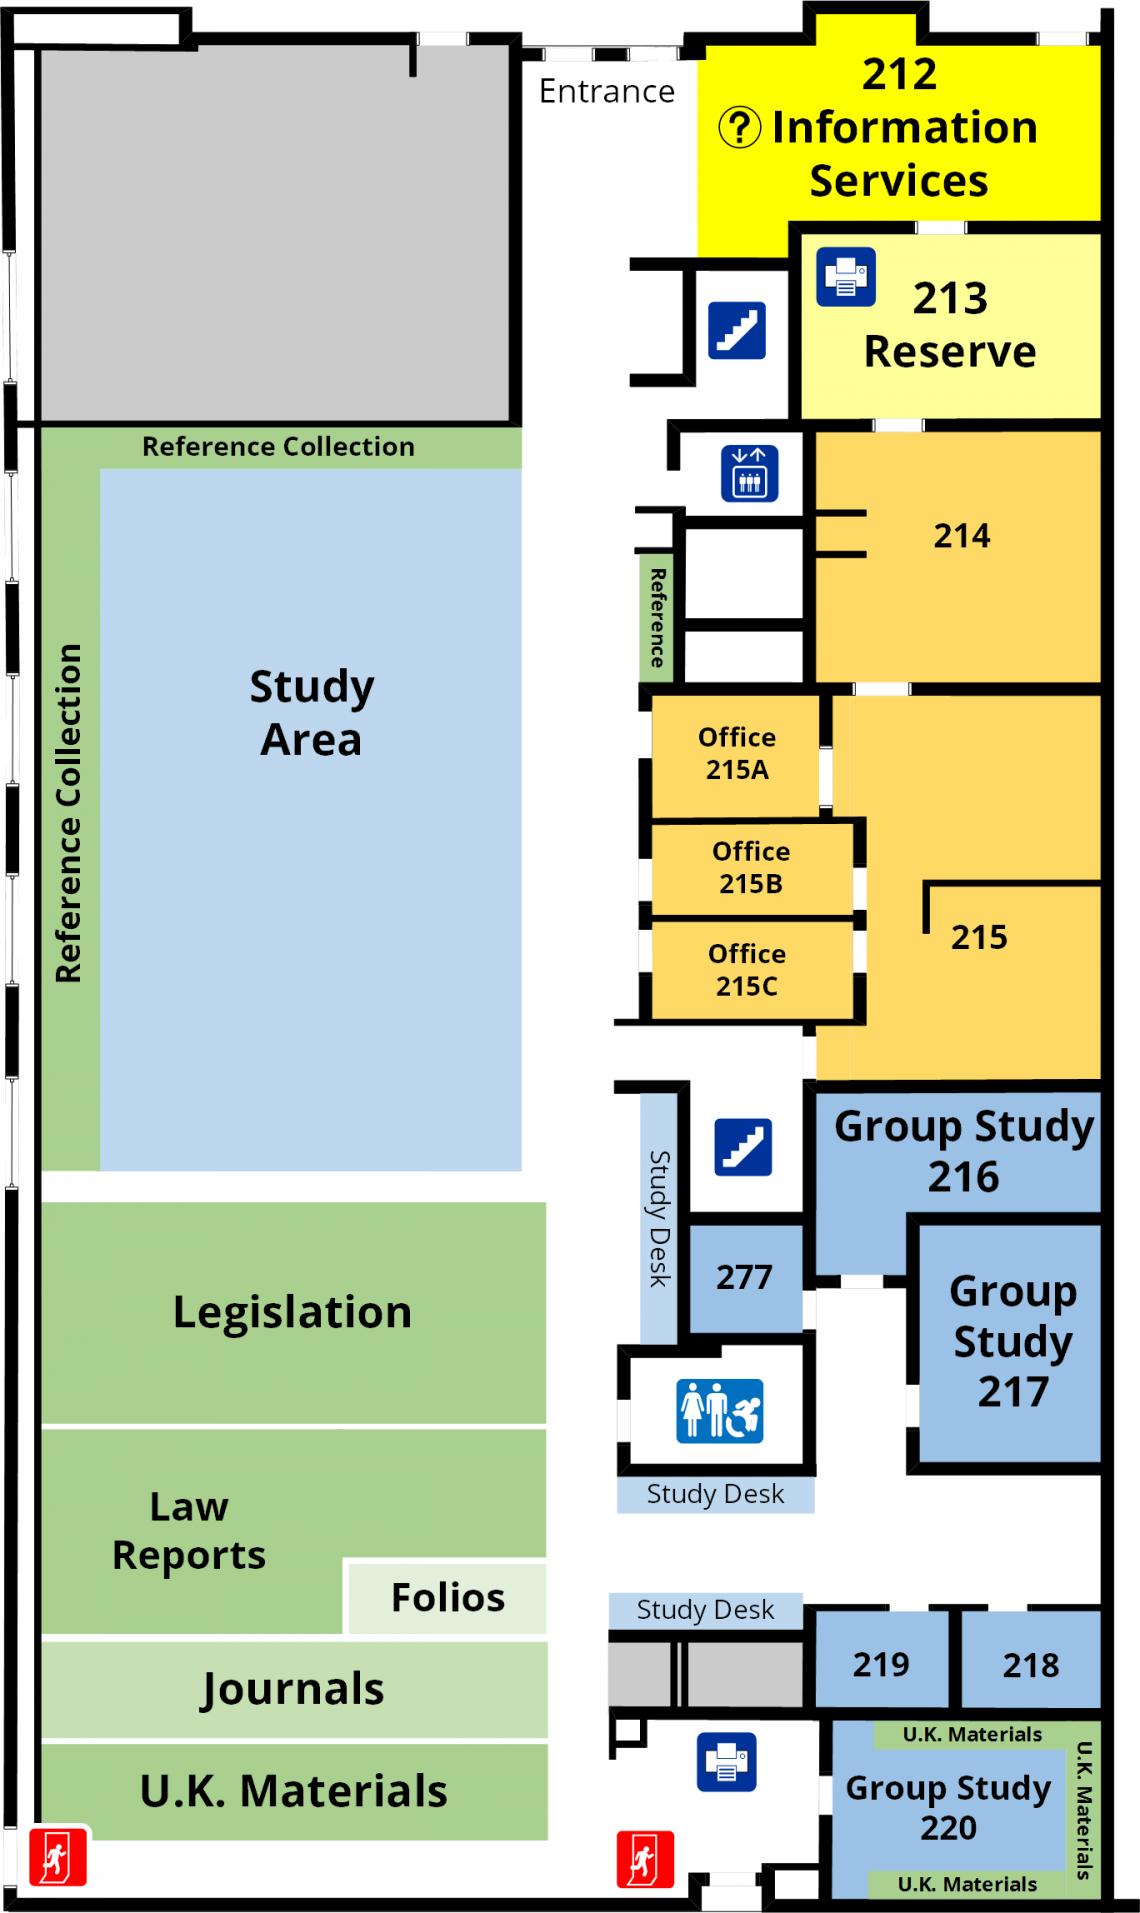 Lederman Law Library First Floor Floorplan